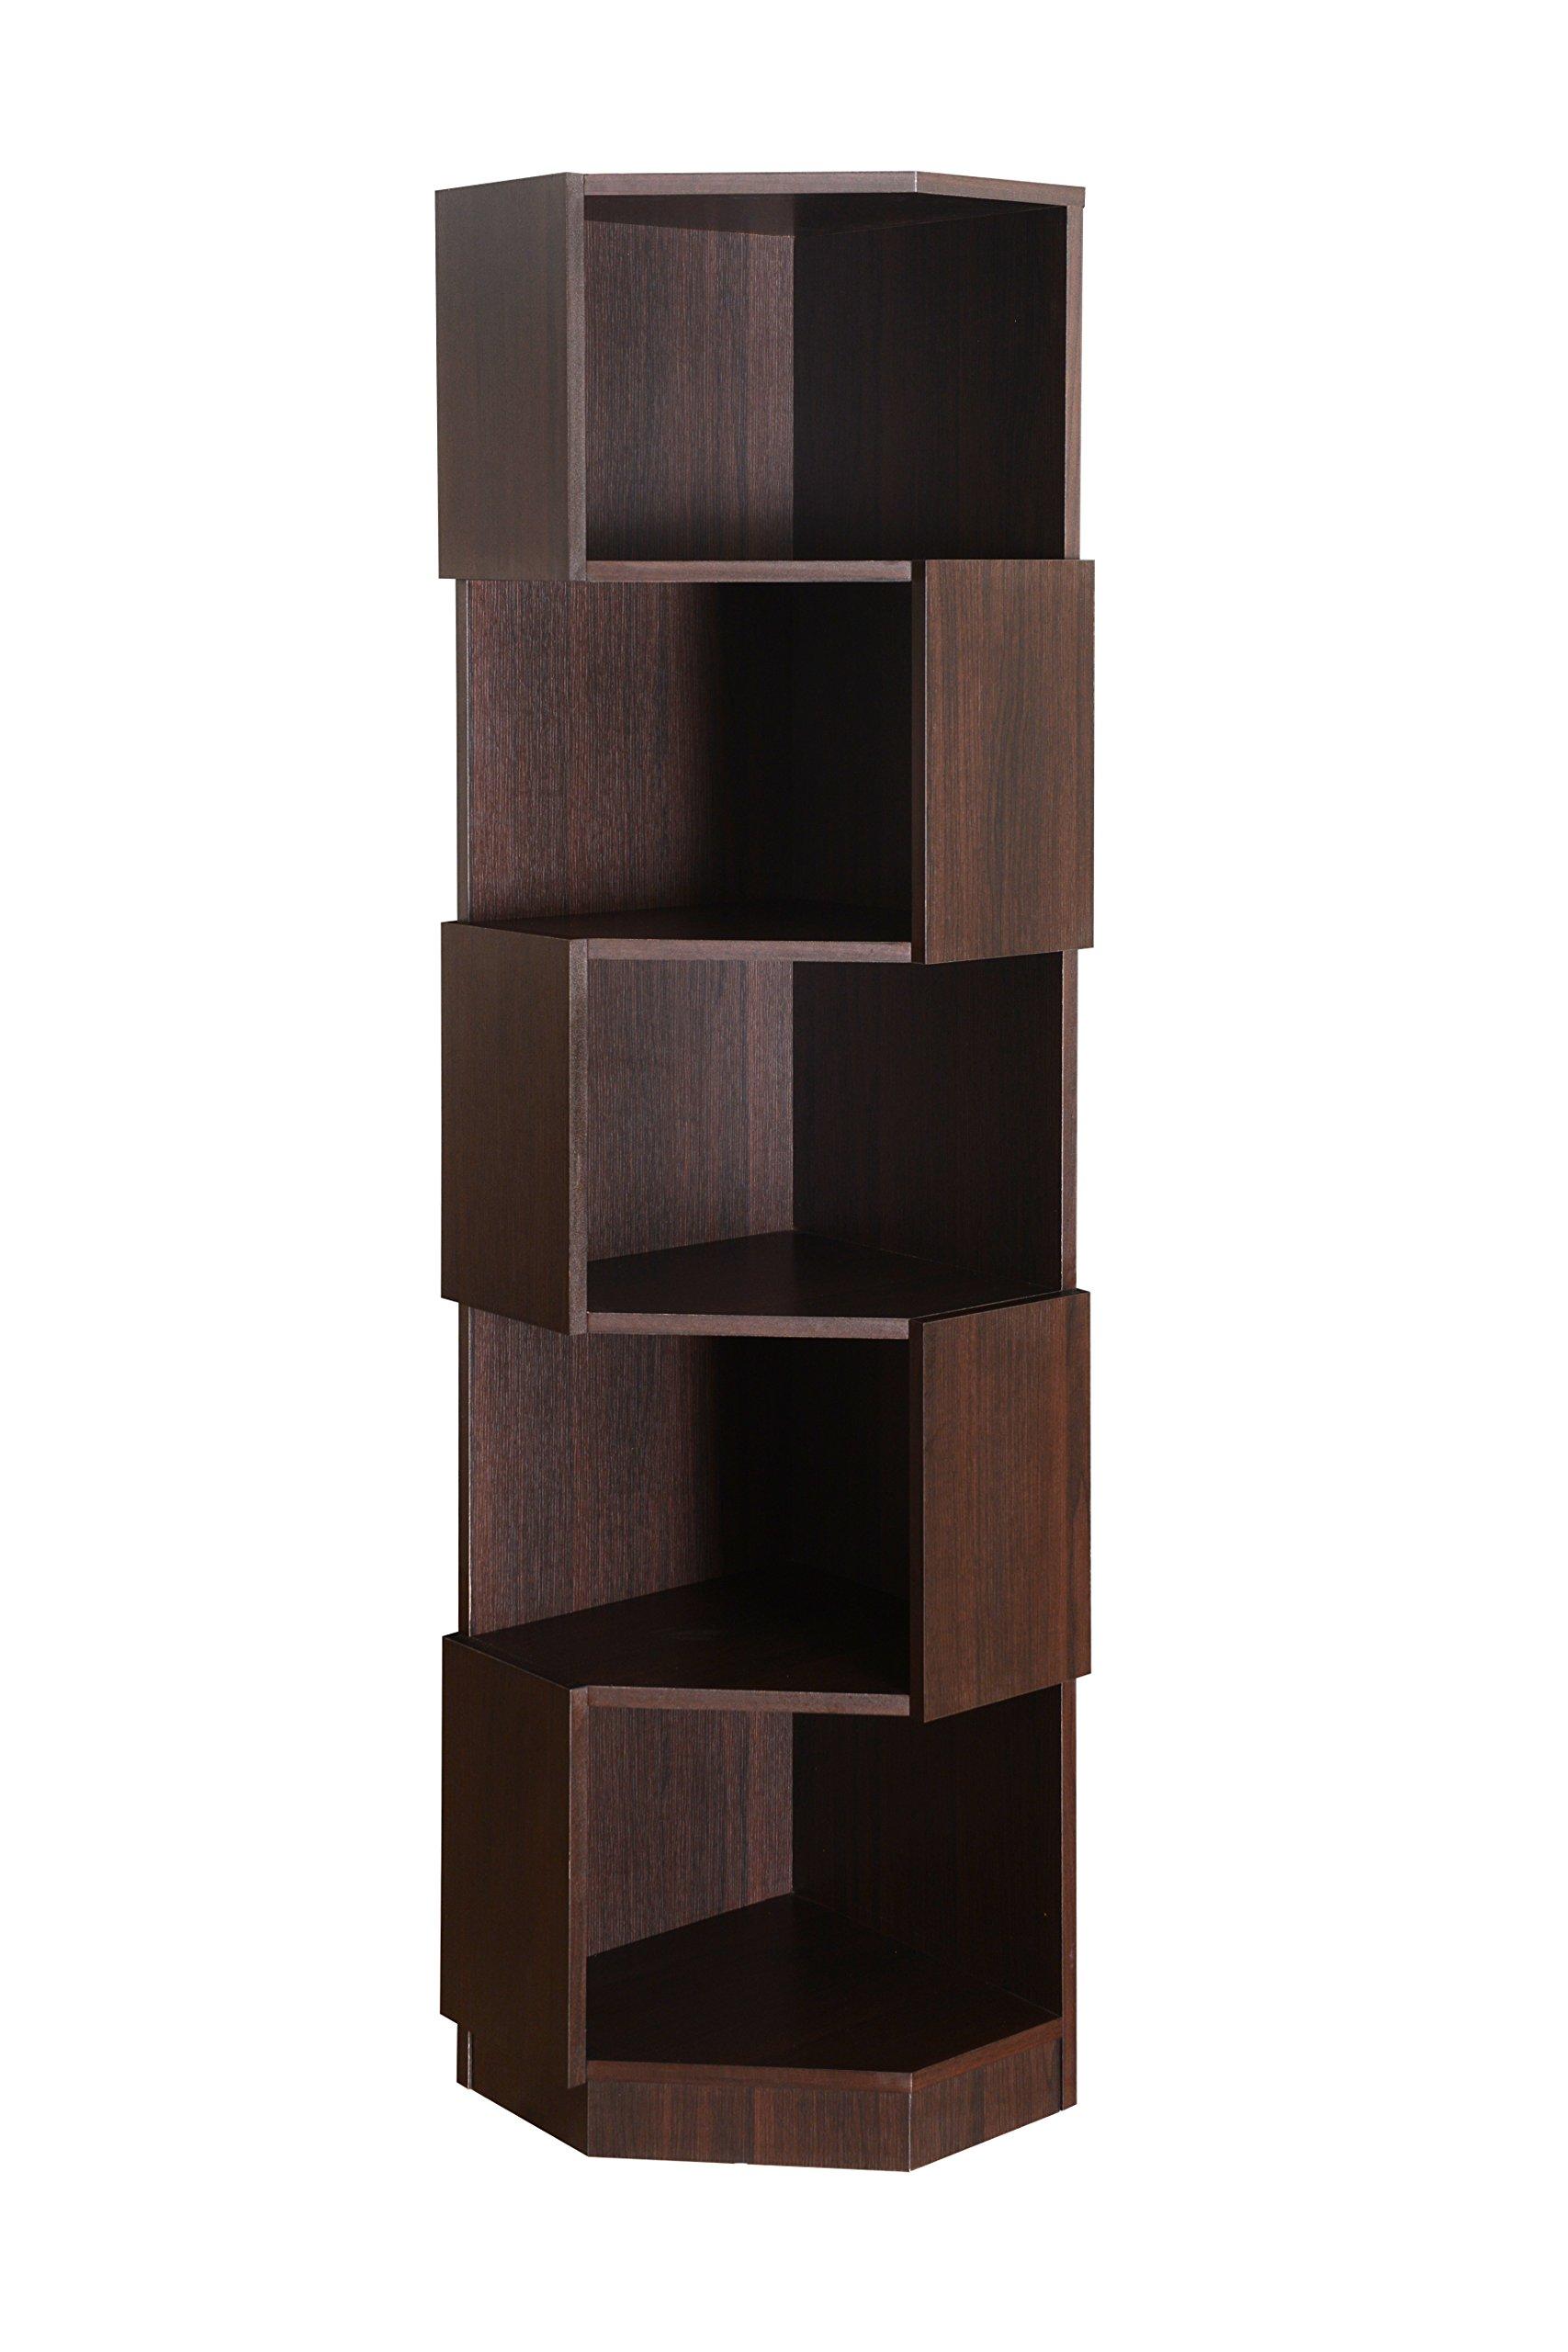 Furniture of America Bassey 5-Shelf Bookcase Display Stand, Espresso